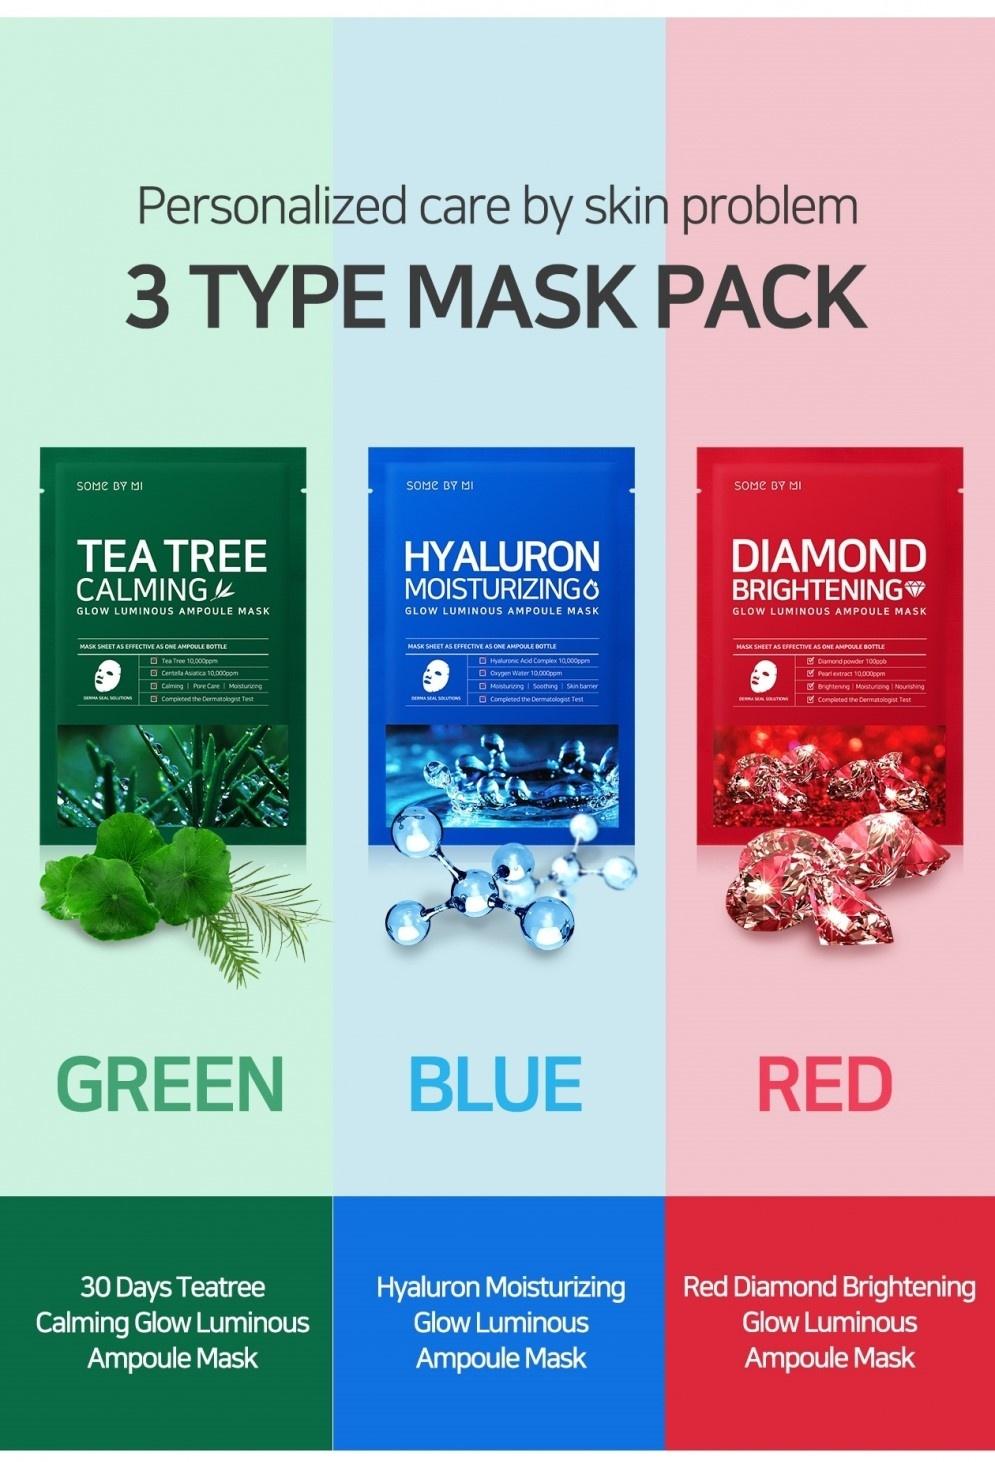 Tea Tree Calming Glow Luminous Ampoule Mask-7